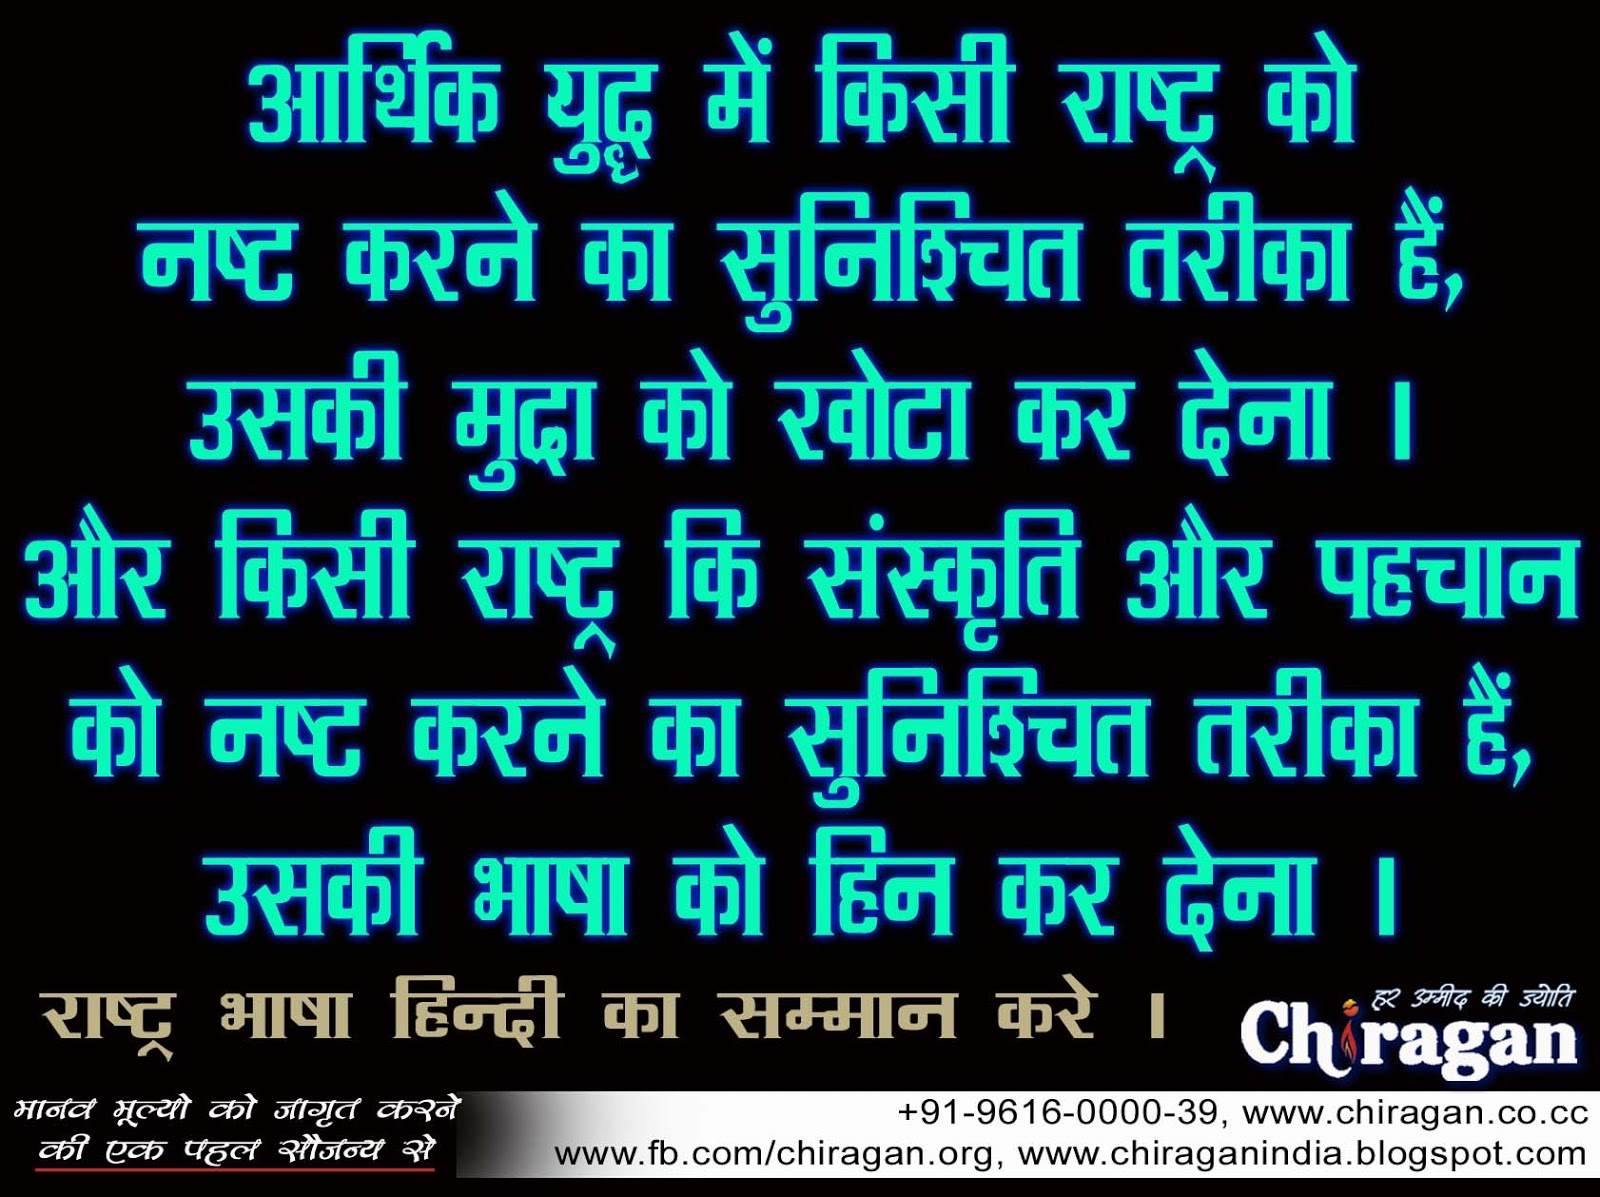 hindi hamari rashtra bhasha Hindi being an easy and conductive language, it is simple to communicate and convey thoughts in the nation  rashtra bhasha (national language):.